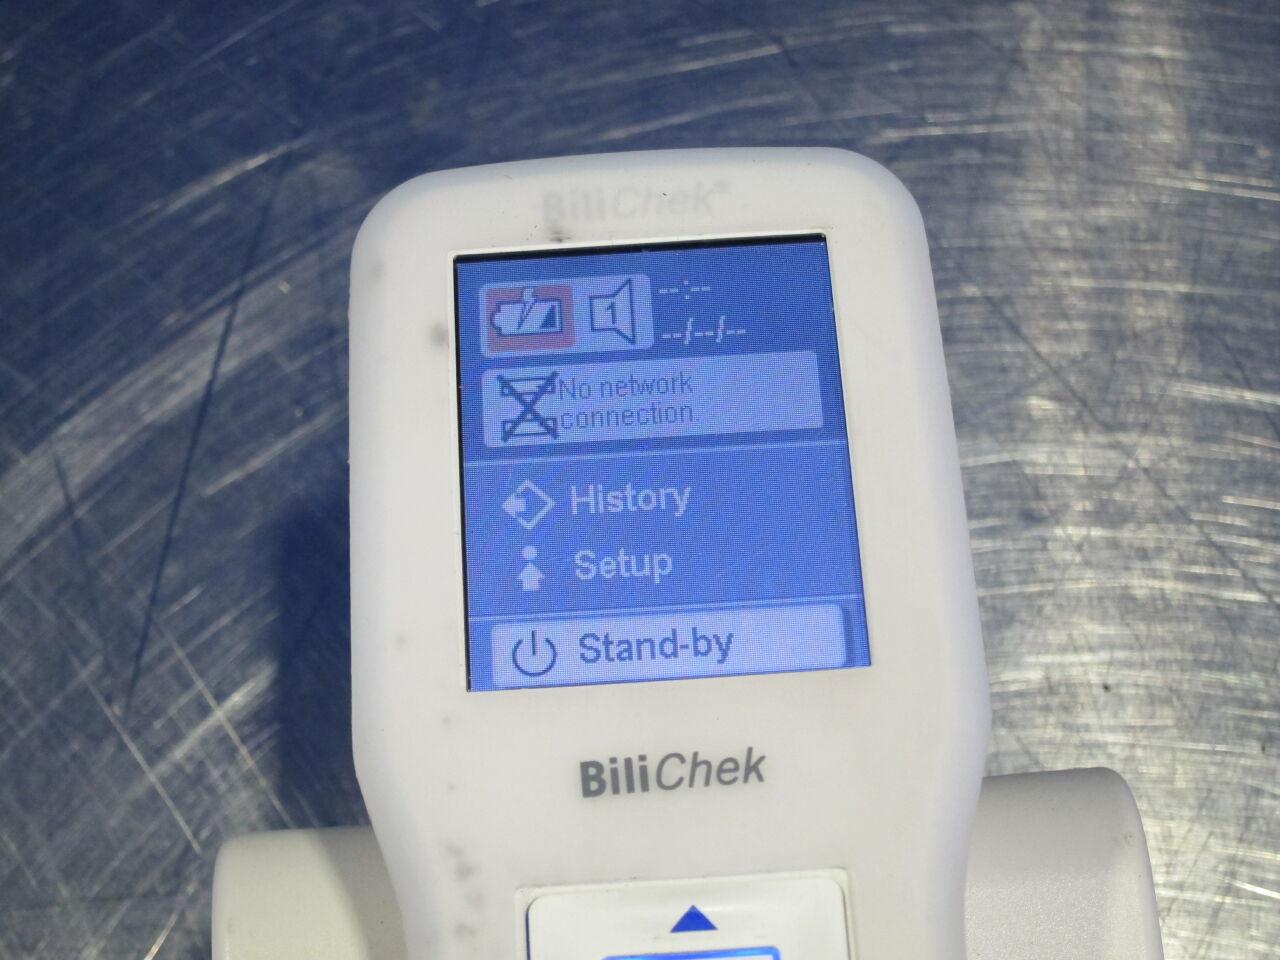 CHILDREN'S MEDICAL VENTURES BiliChek Bilirubinometer